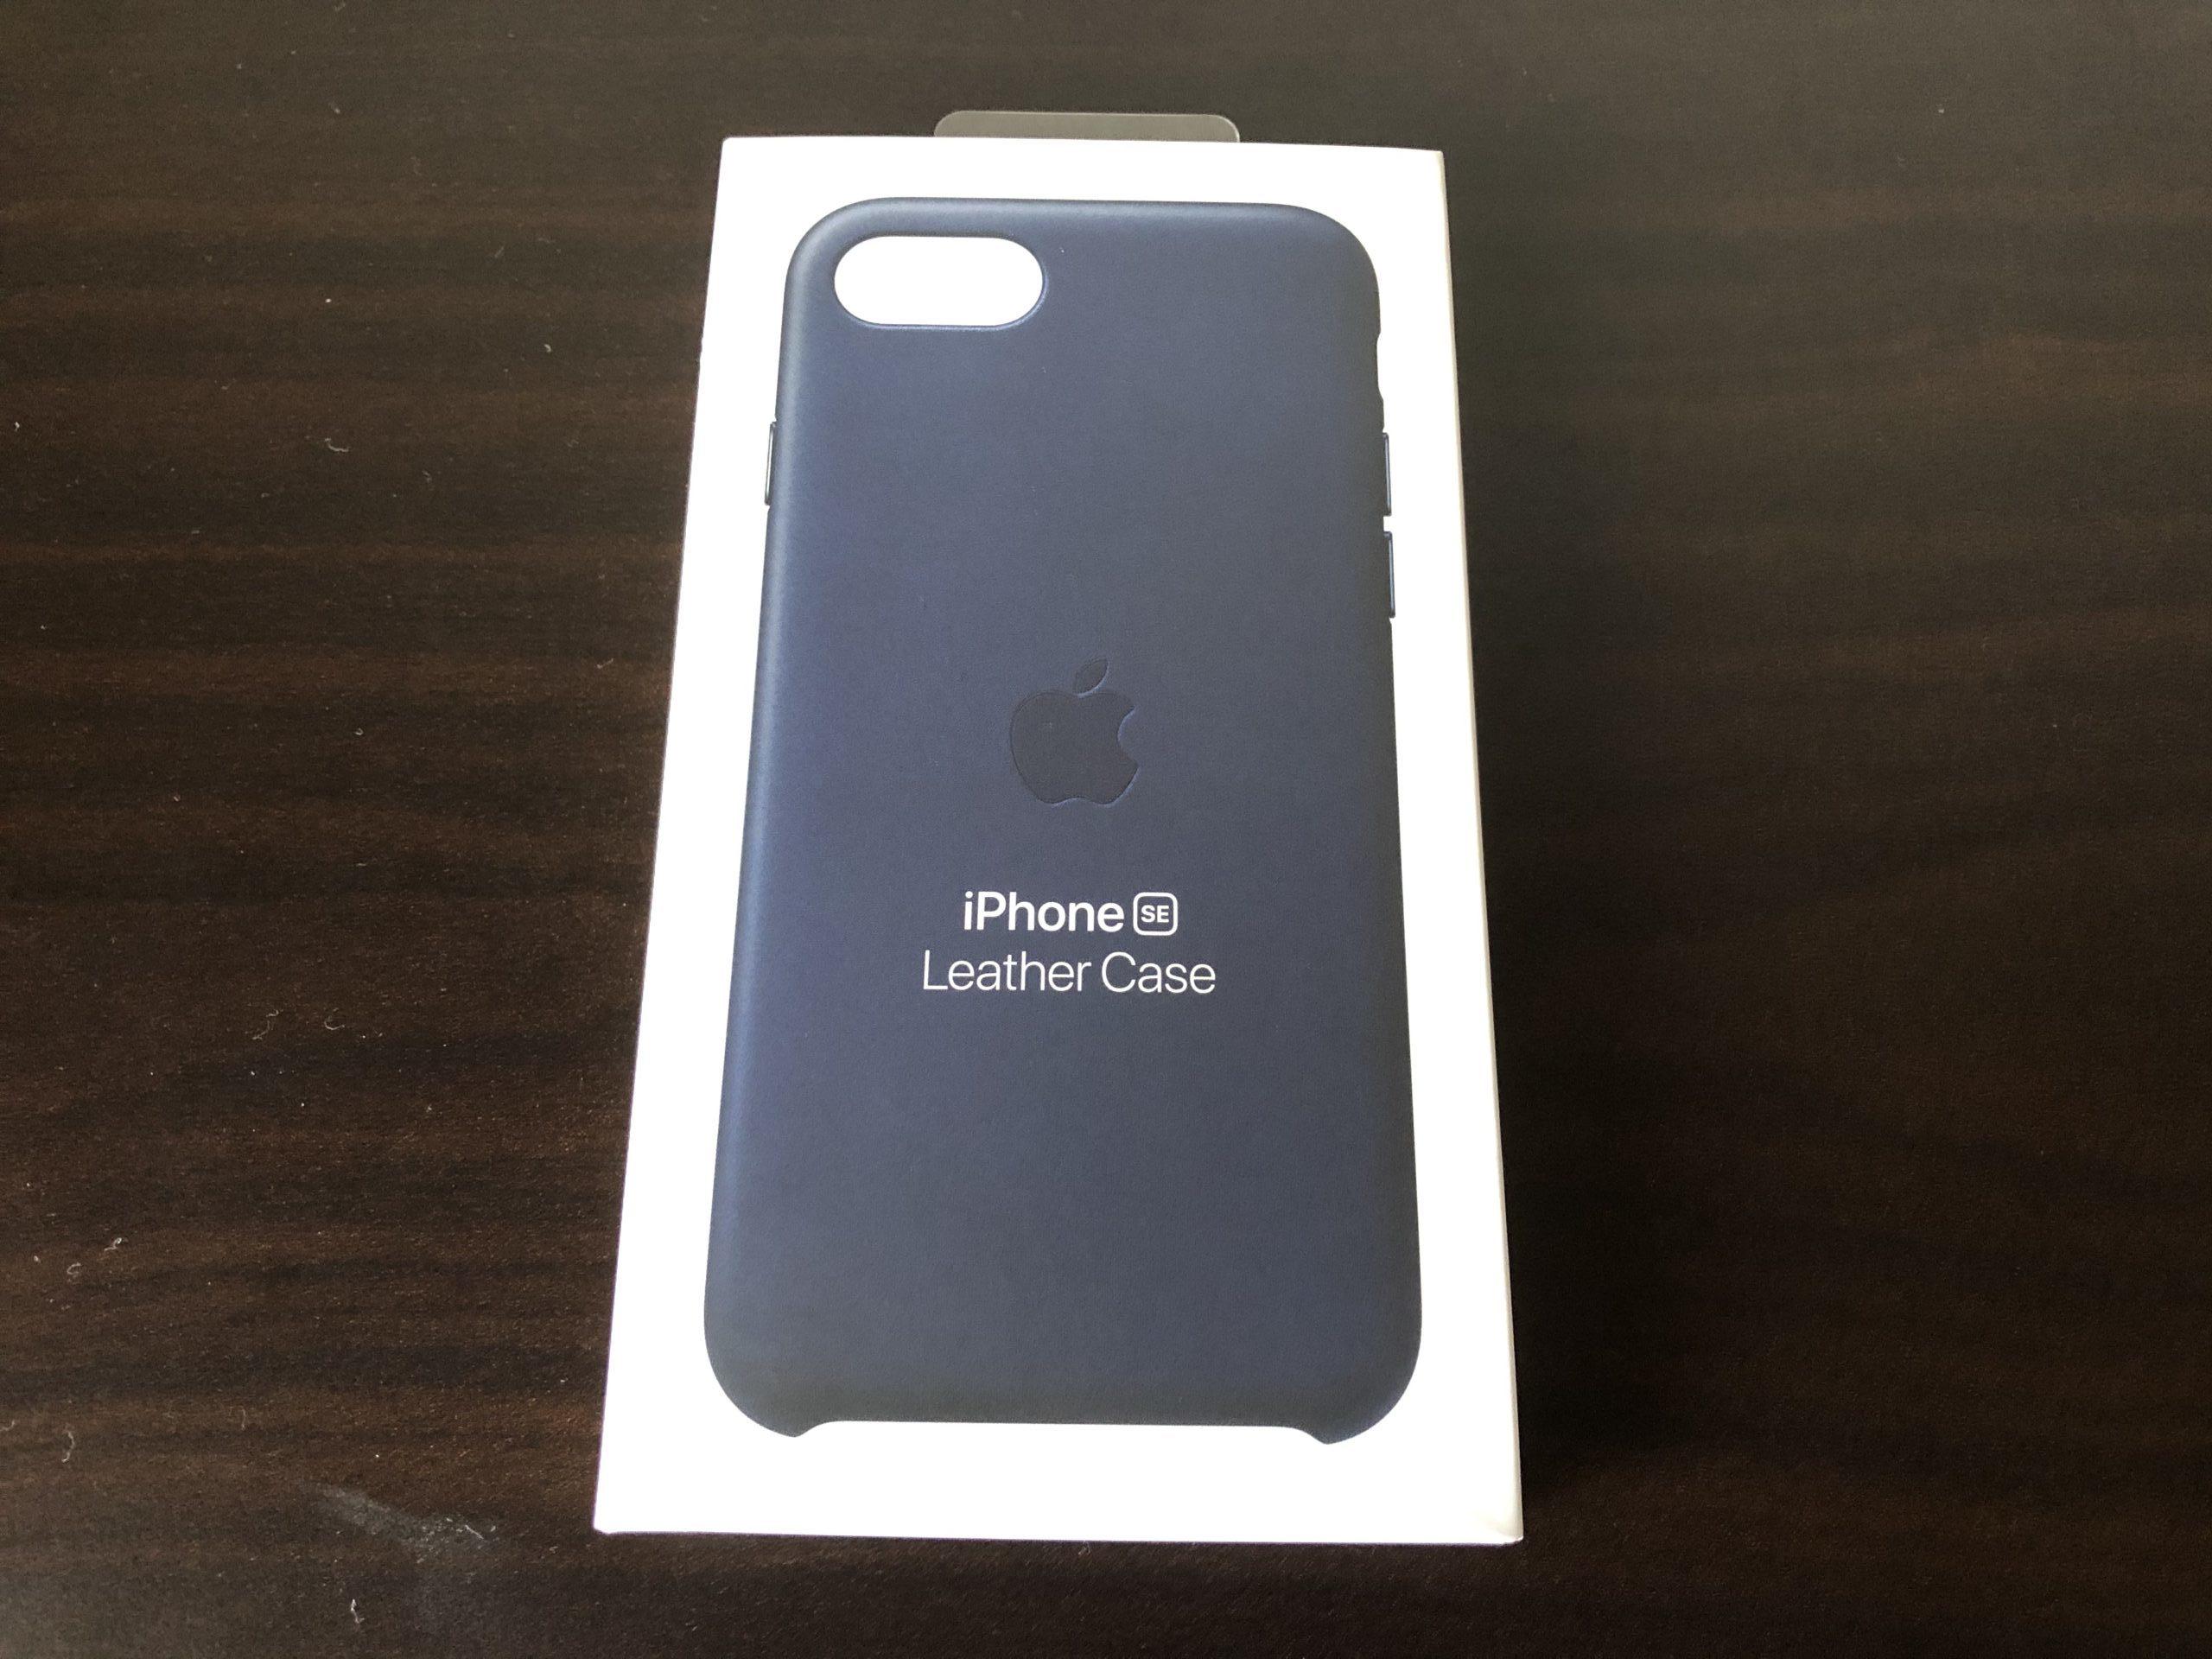 iPhone SE 純正レザーケース  質感と手触りに作り手のこだわりを感じます!